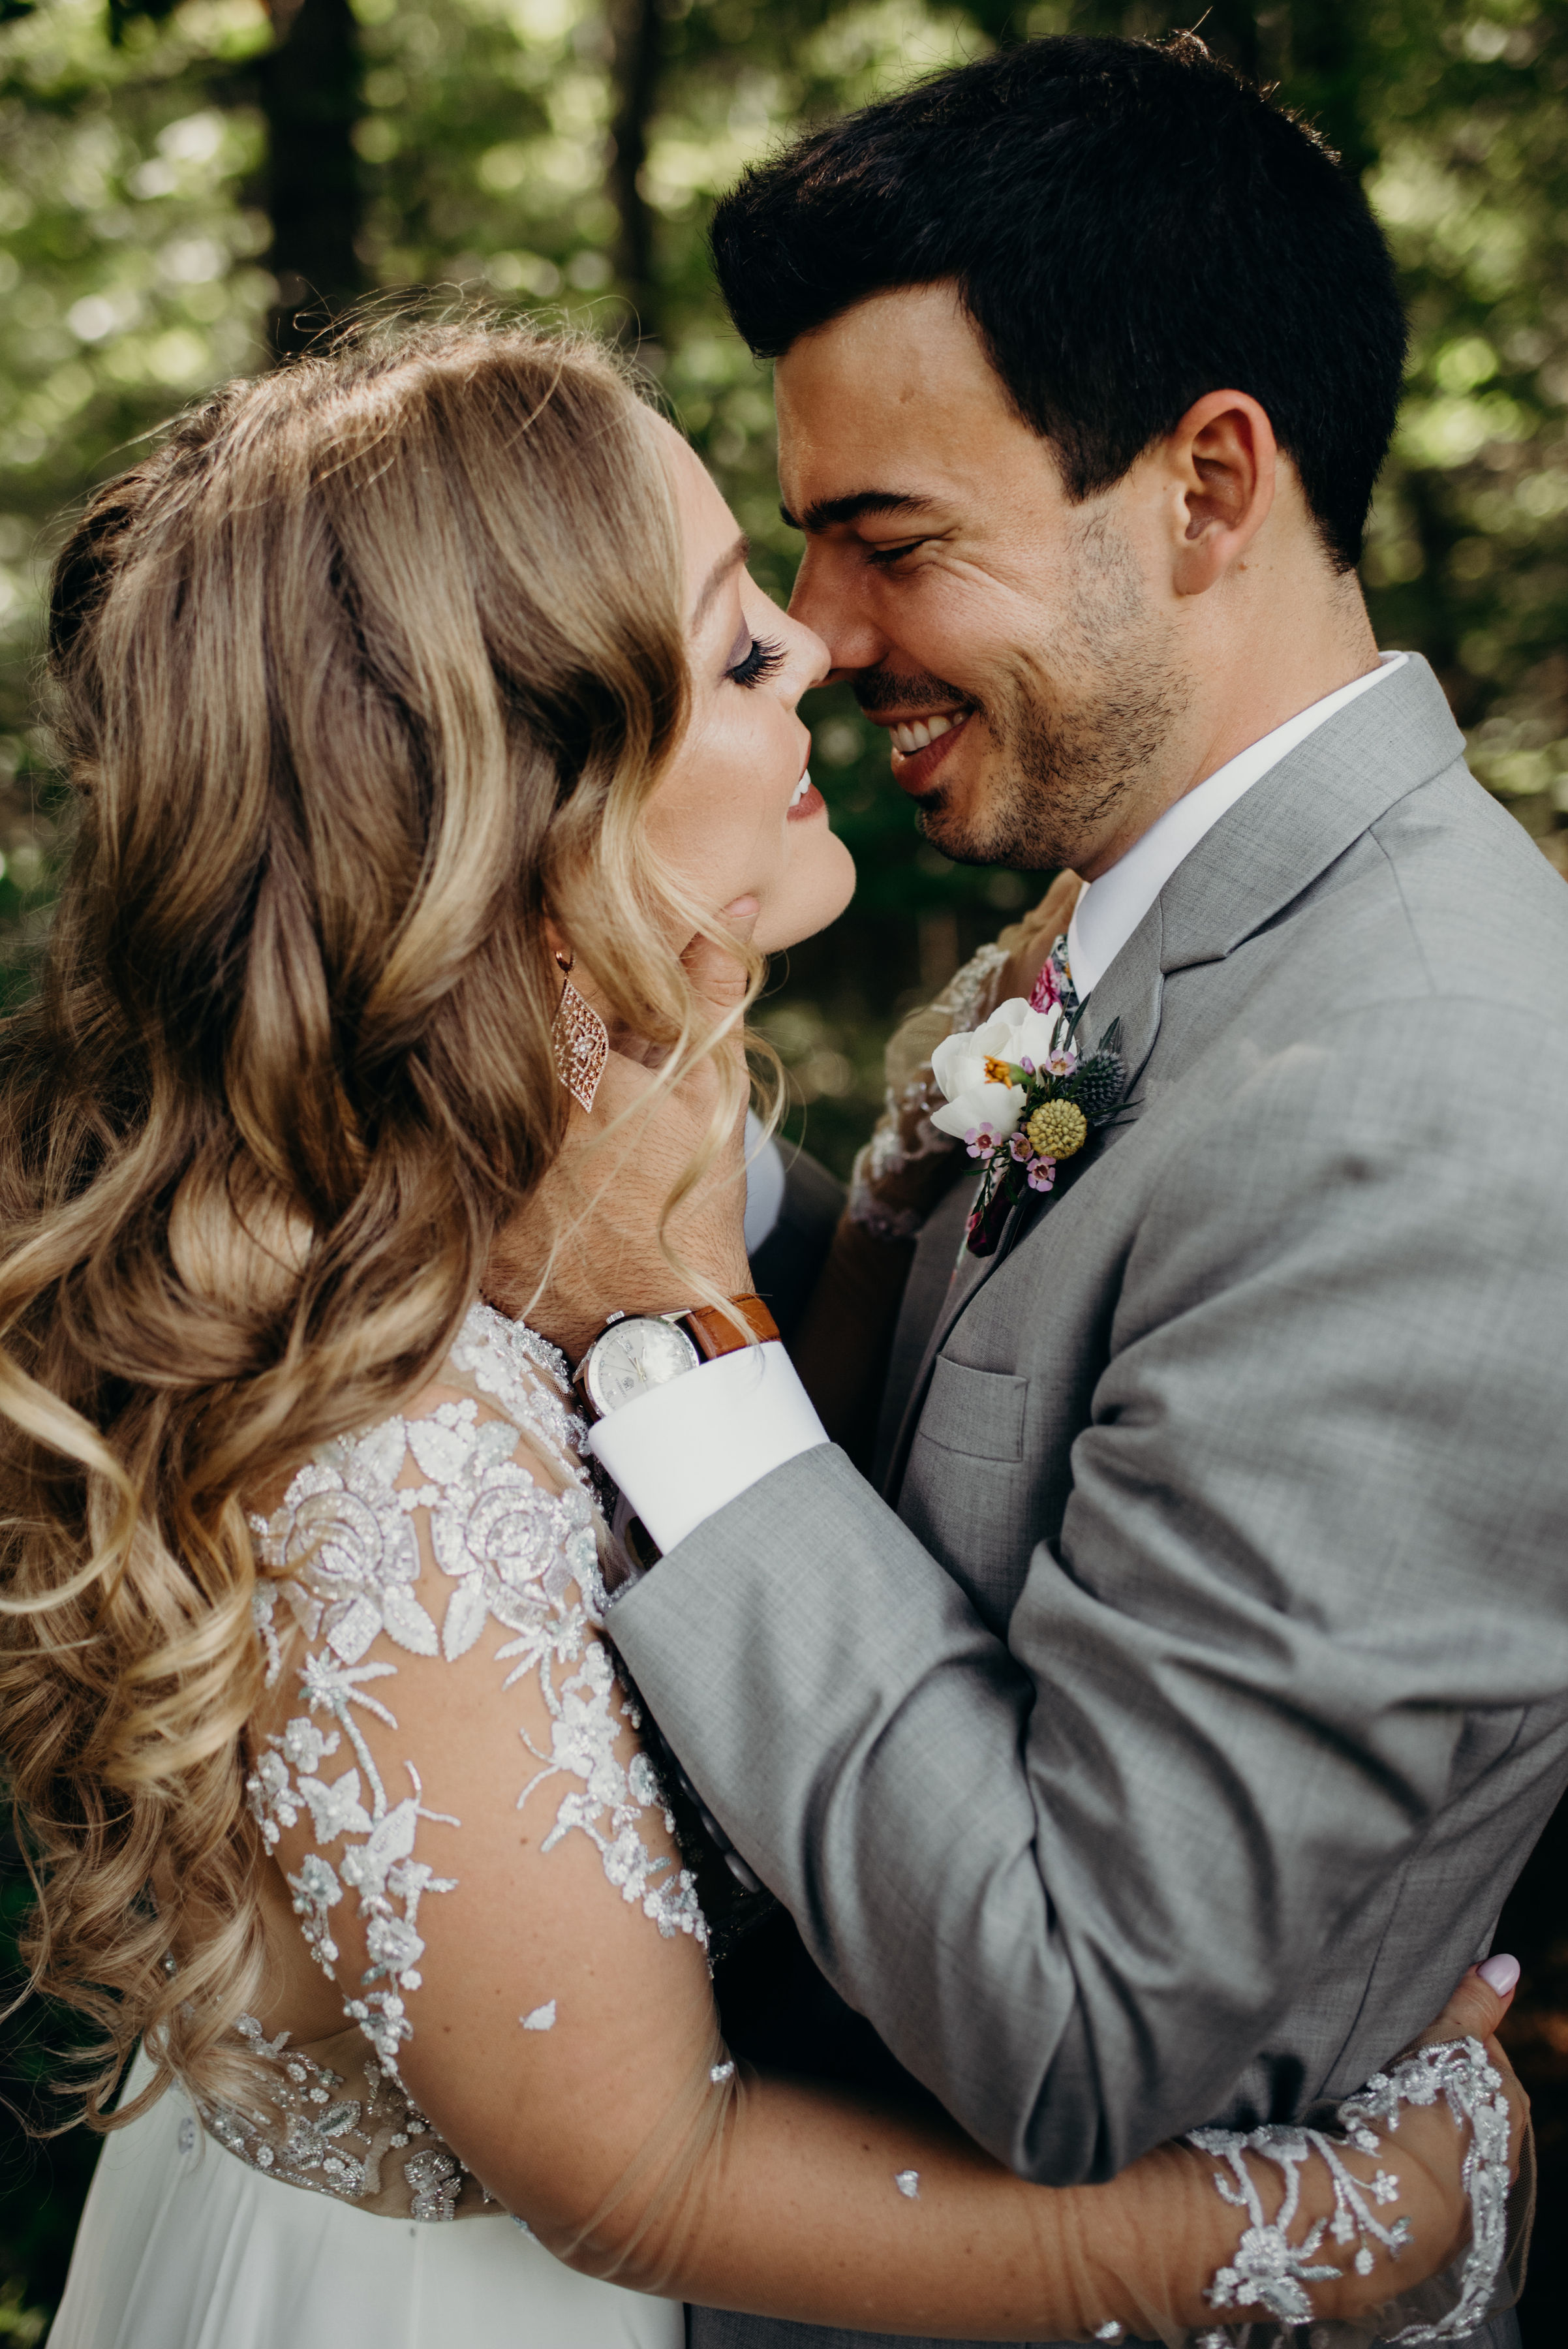 ryan-lauren-wedding-at-montfair-resort-farm-lindsey-paradiso-photography-7739.jpg